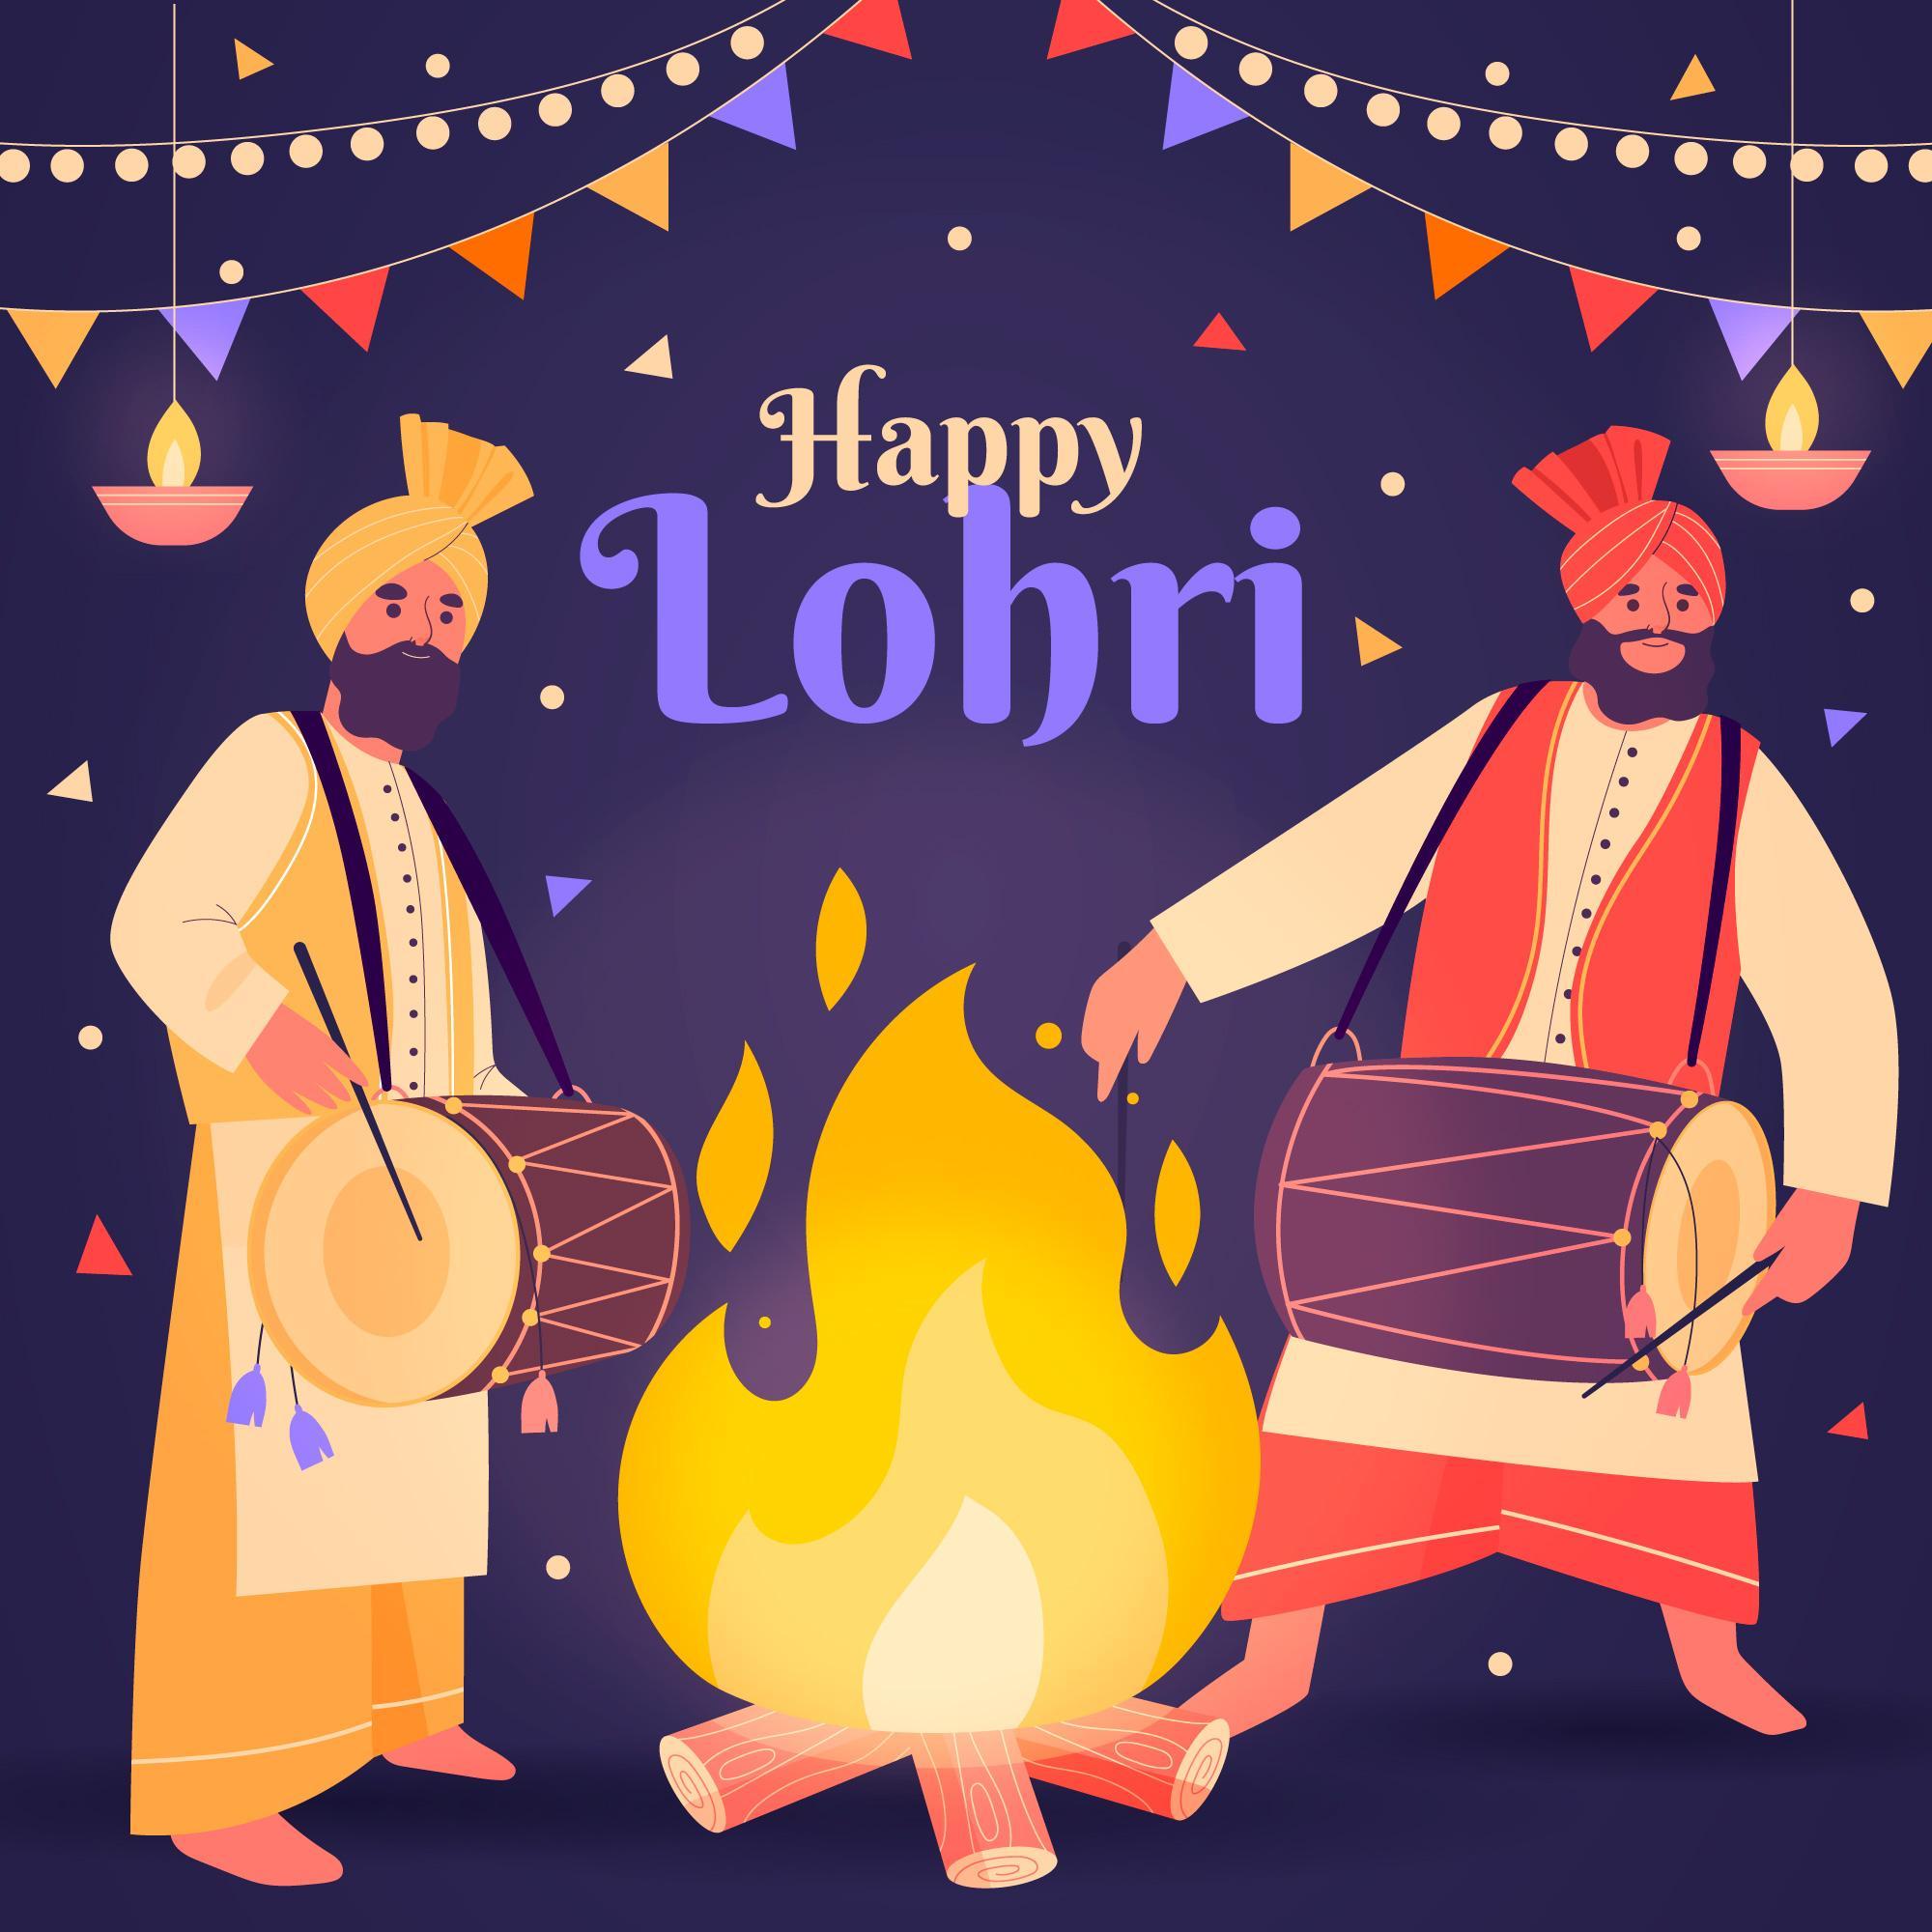 Happy Lohri Celebration Background With Panjabi Dancers